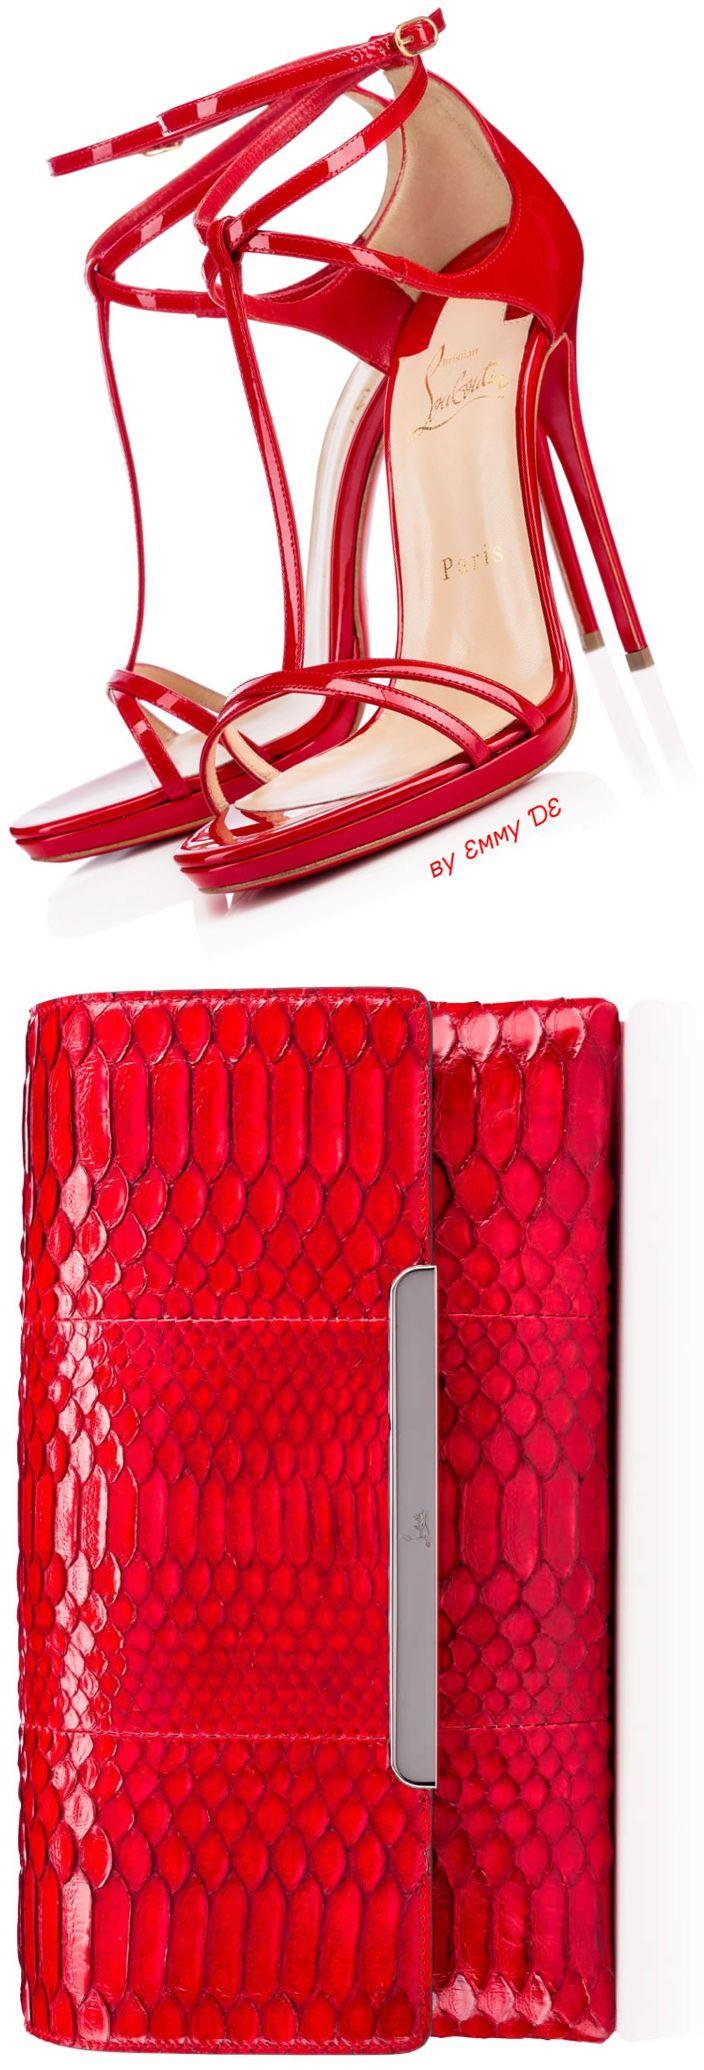 Emmy DE * Christian Louboutin Benedetta Patent Heels & Rougissime Python Clark/Calf Clutch